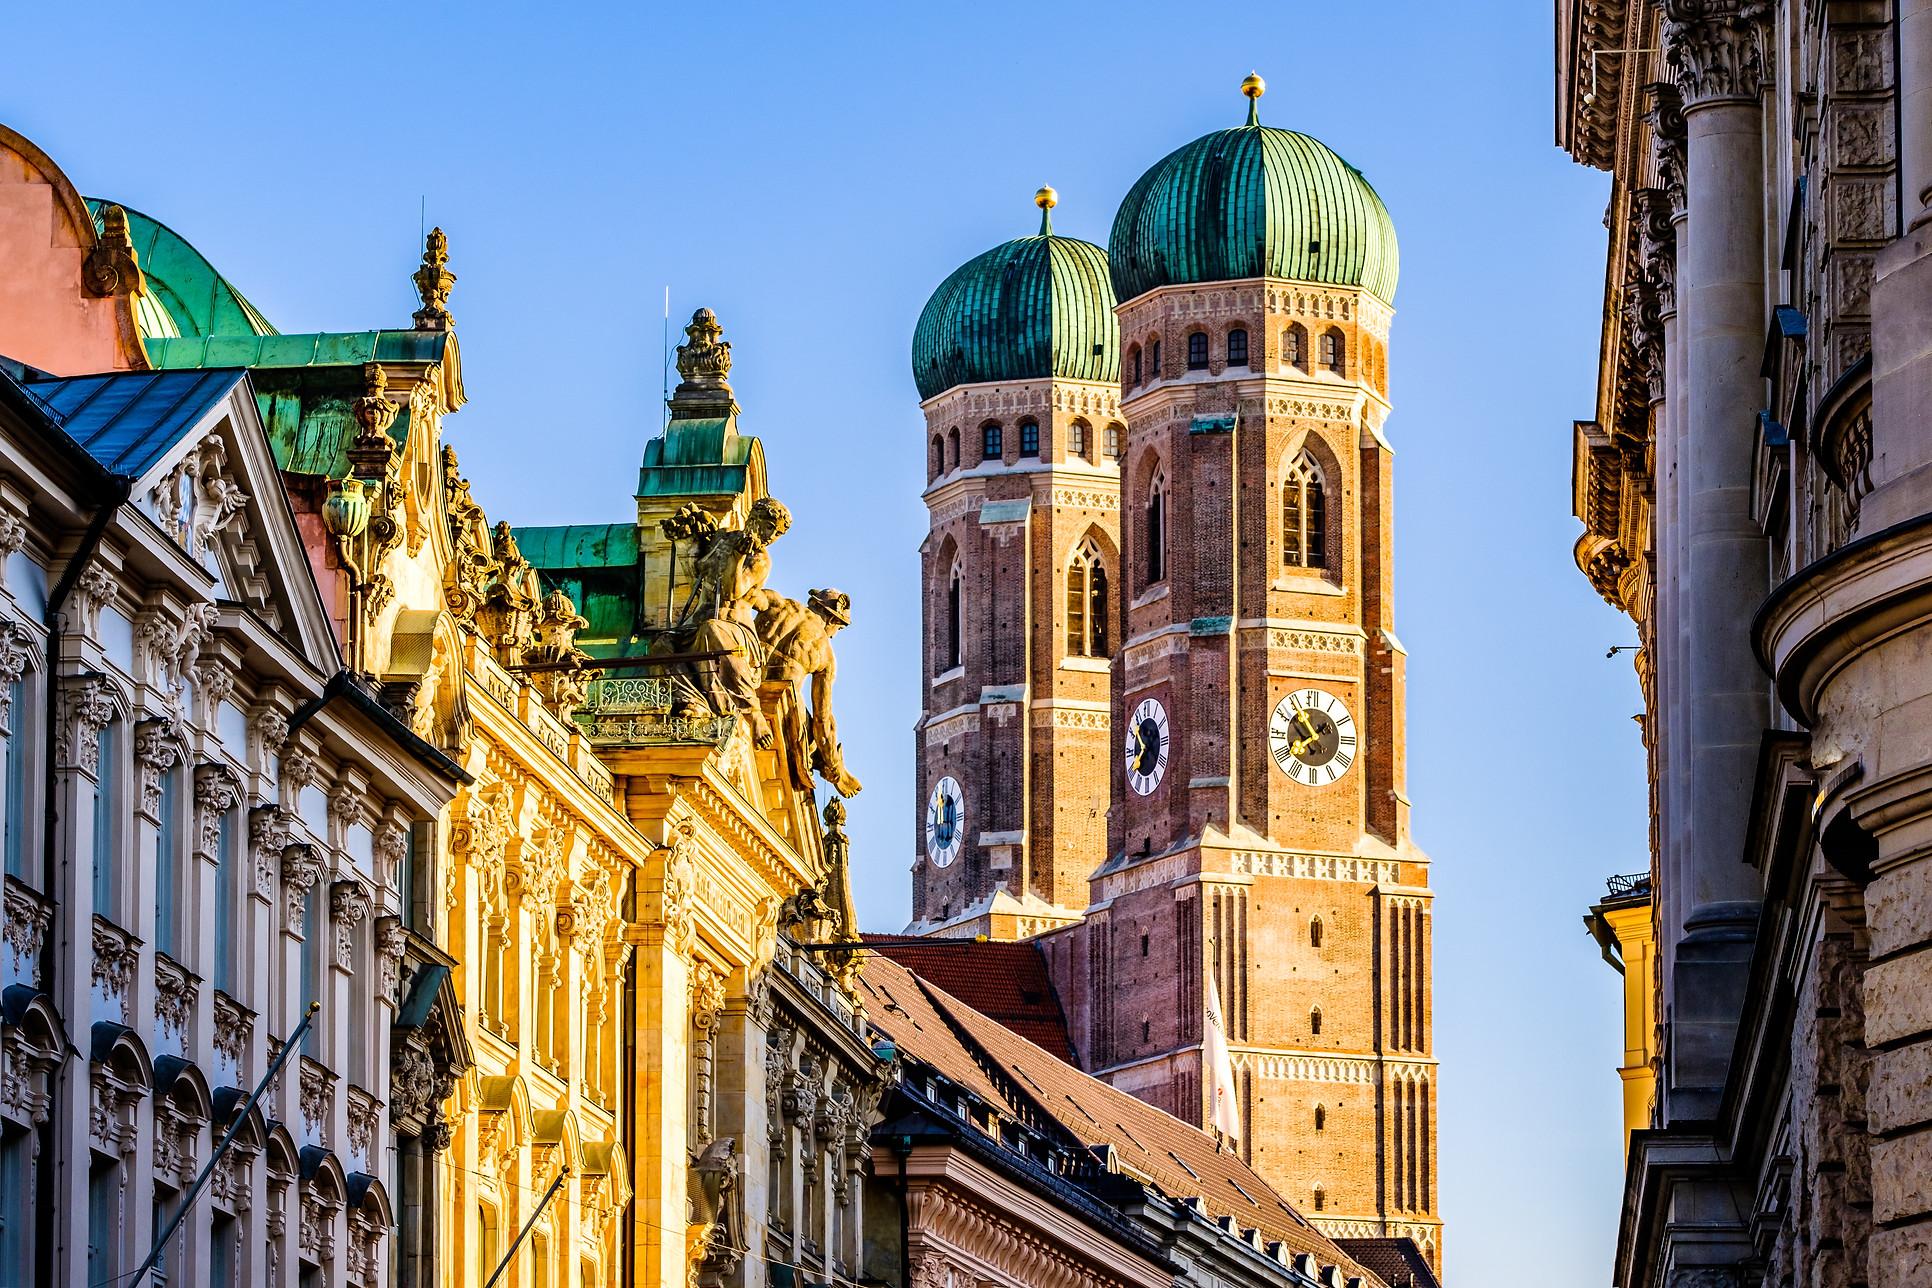 Munich Cathedral - Liebfrauenkirche in M